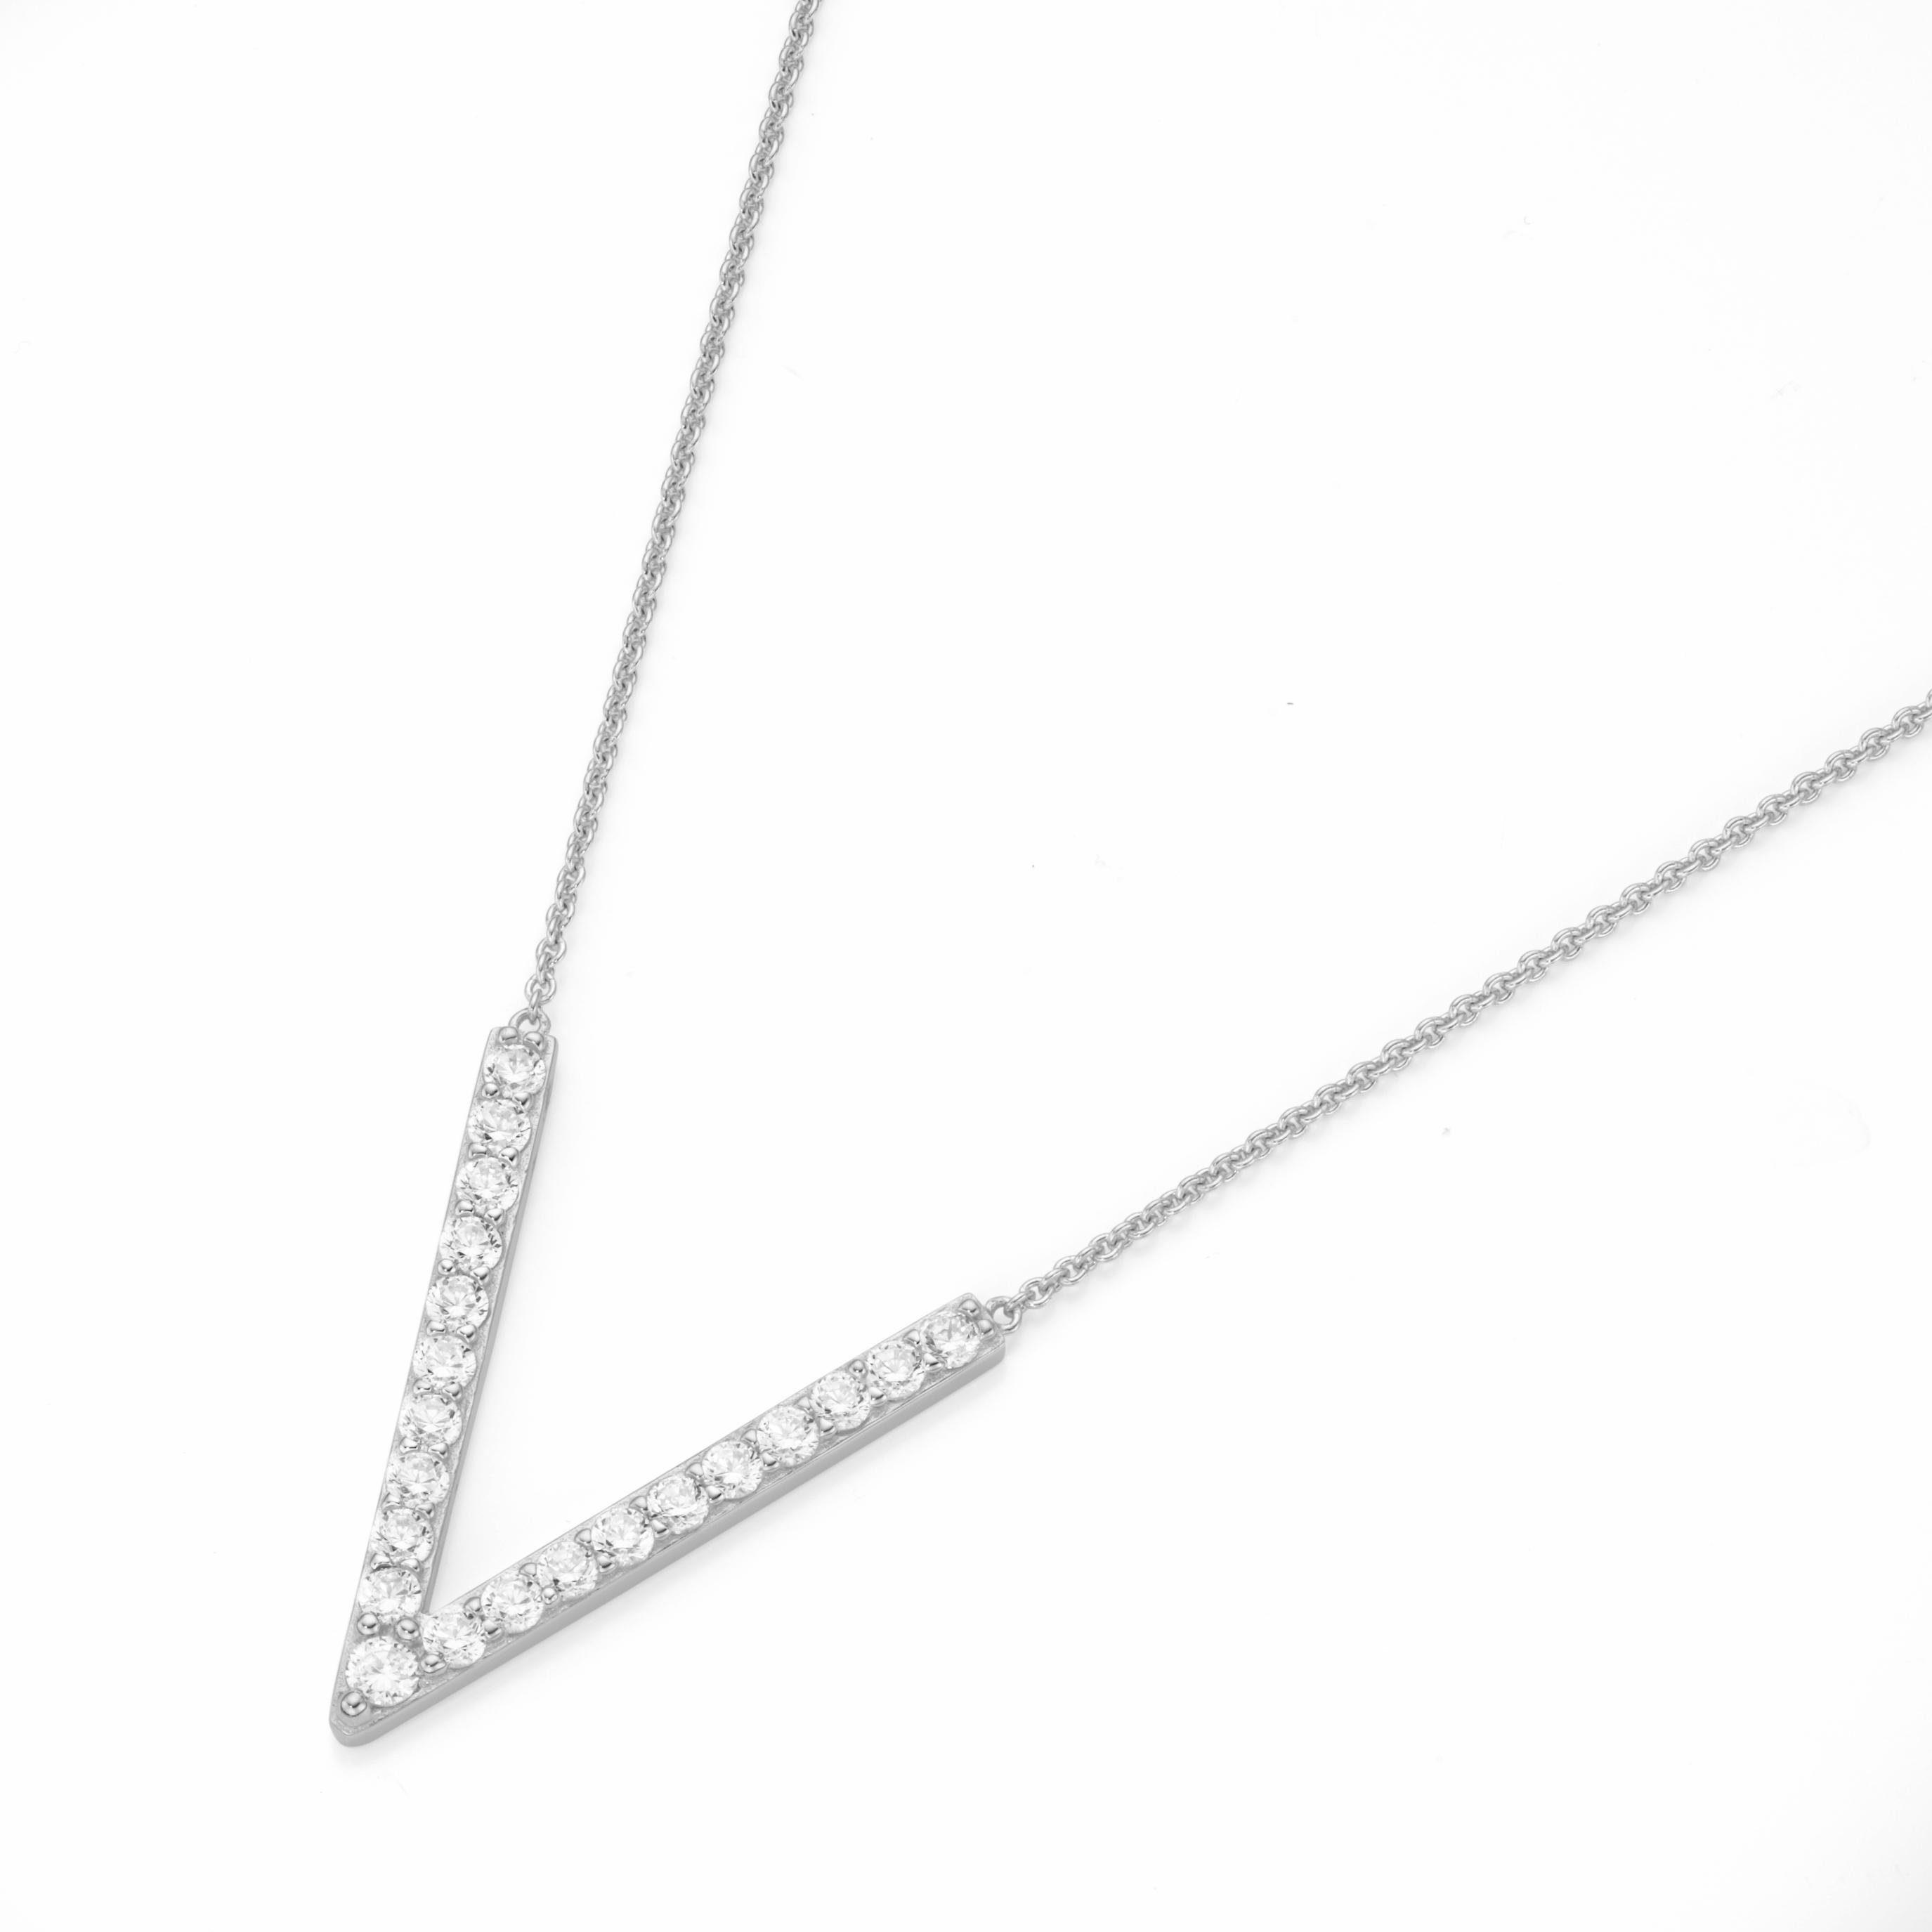 GIORGIO MARTELLO MILANO Silberkette »195138693450«, mit Zirkonia